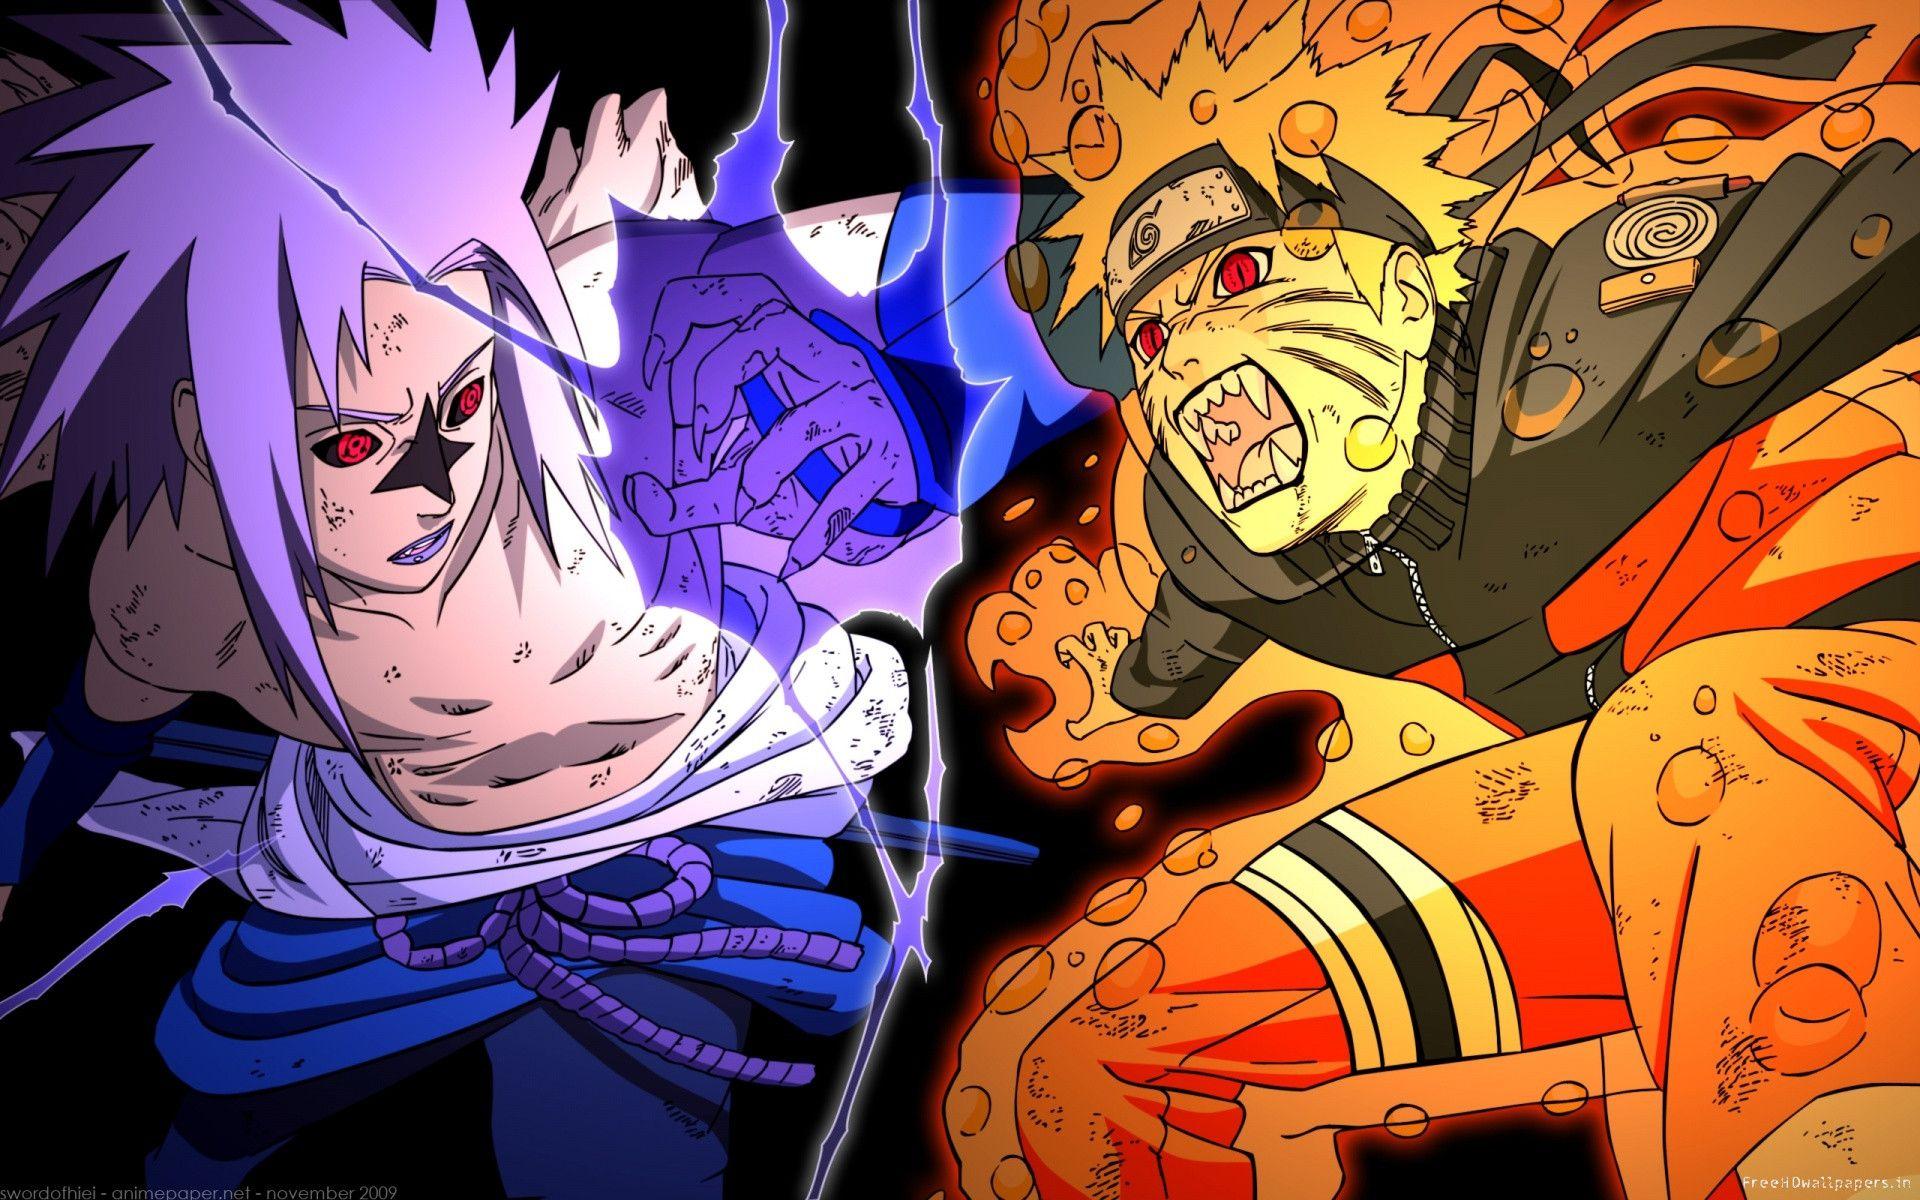 Download 104+ Wallpaper Naruto Bergerak Untuk Laptop Paling Keren